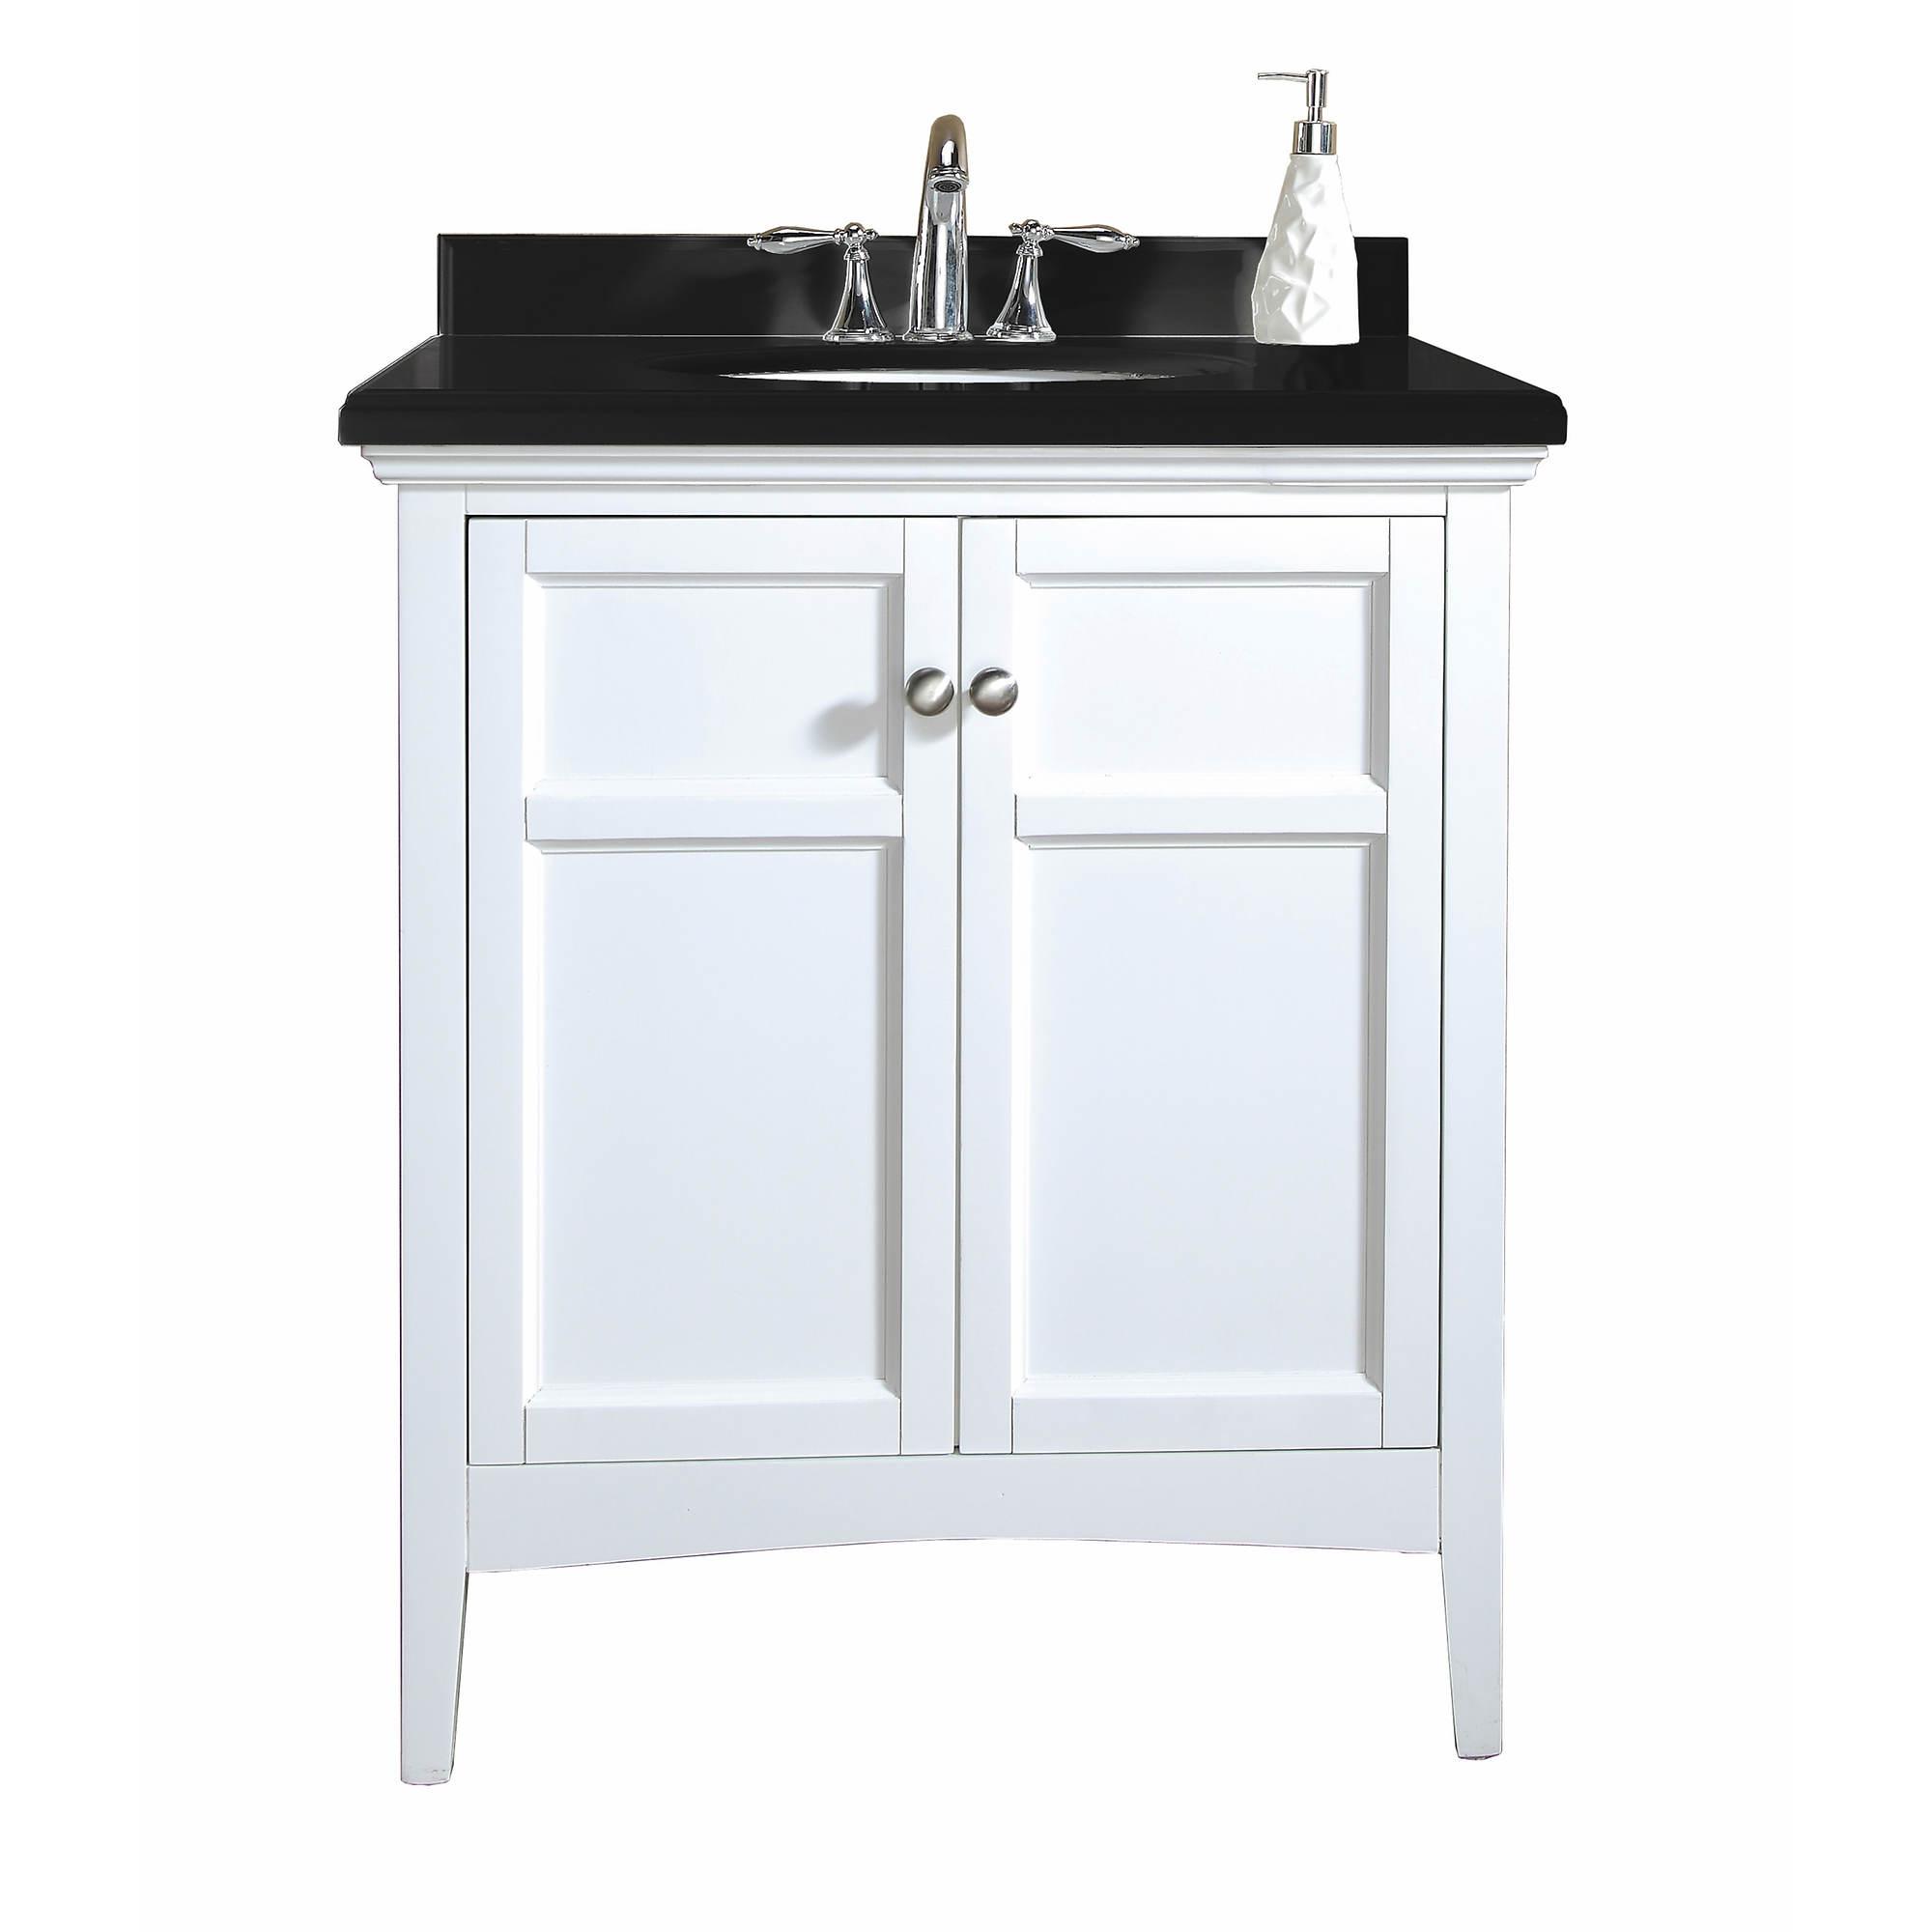 regard permalink wall vanities awesome for l with image mounted storage unbeatable bathroom sink vanity top sale inch